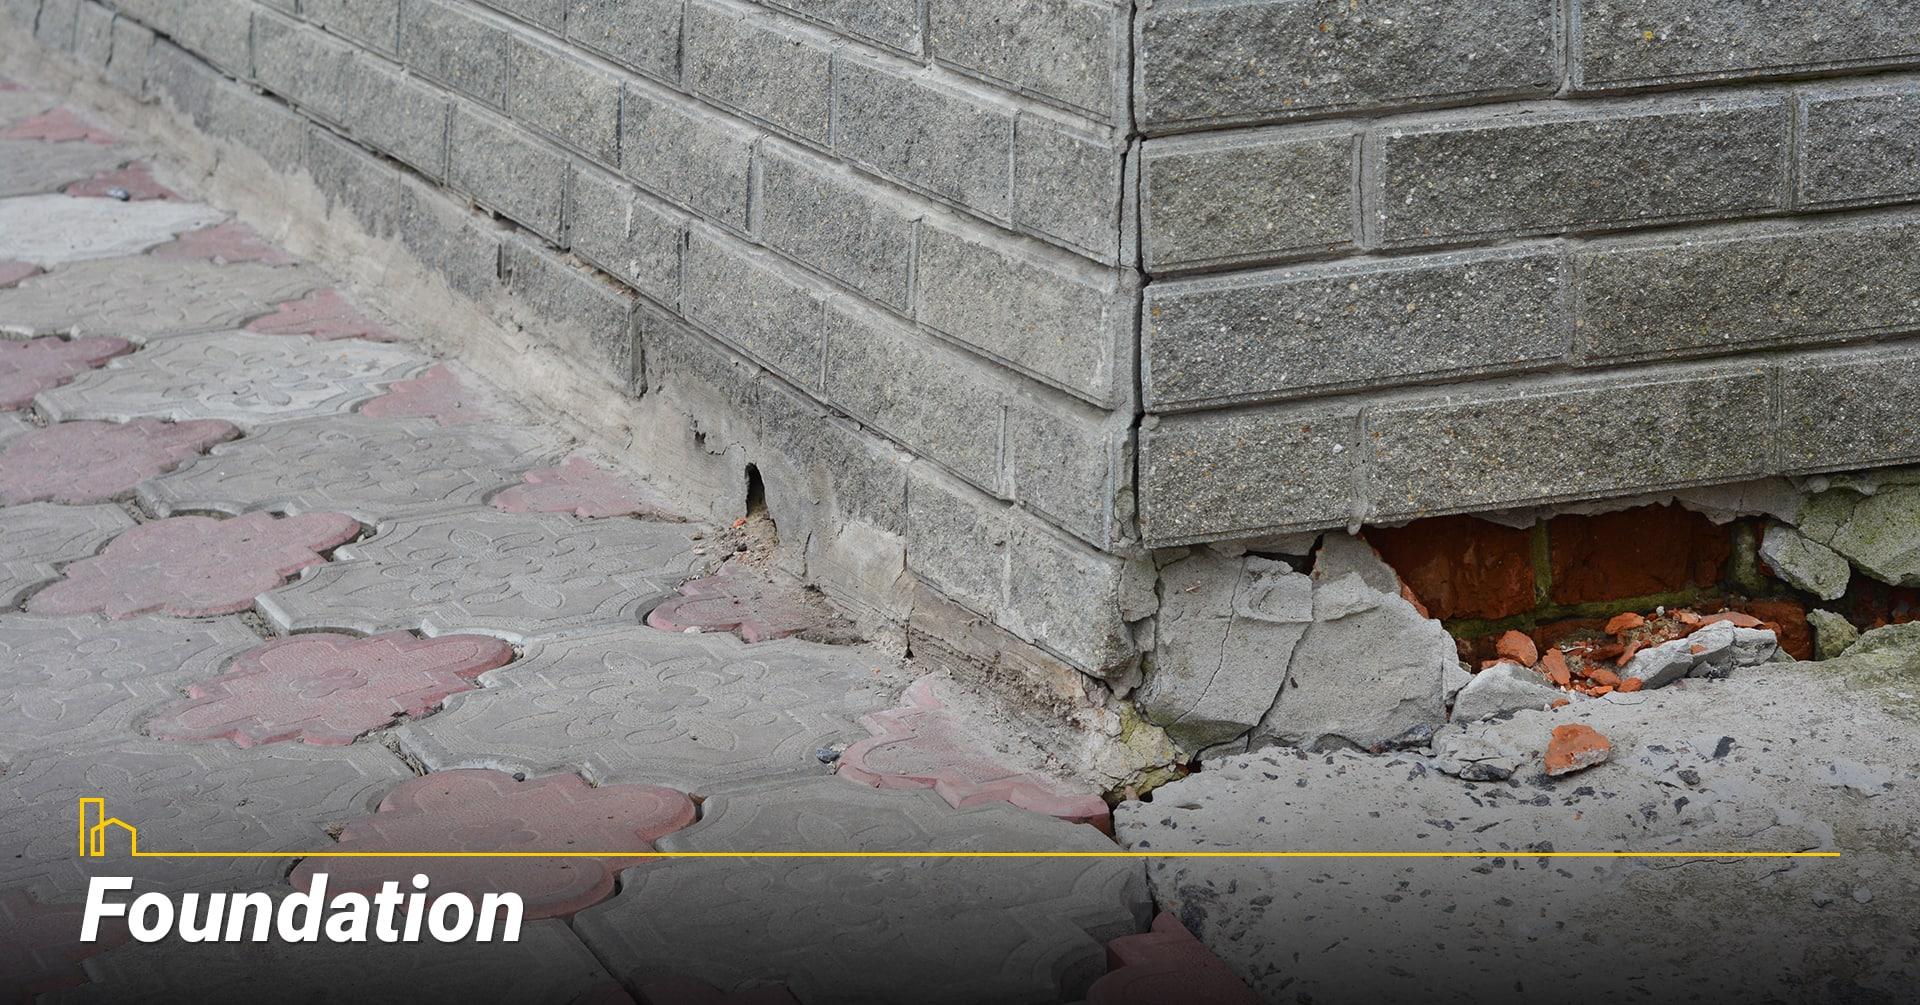 Foundation, repair damaged foundation